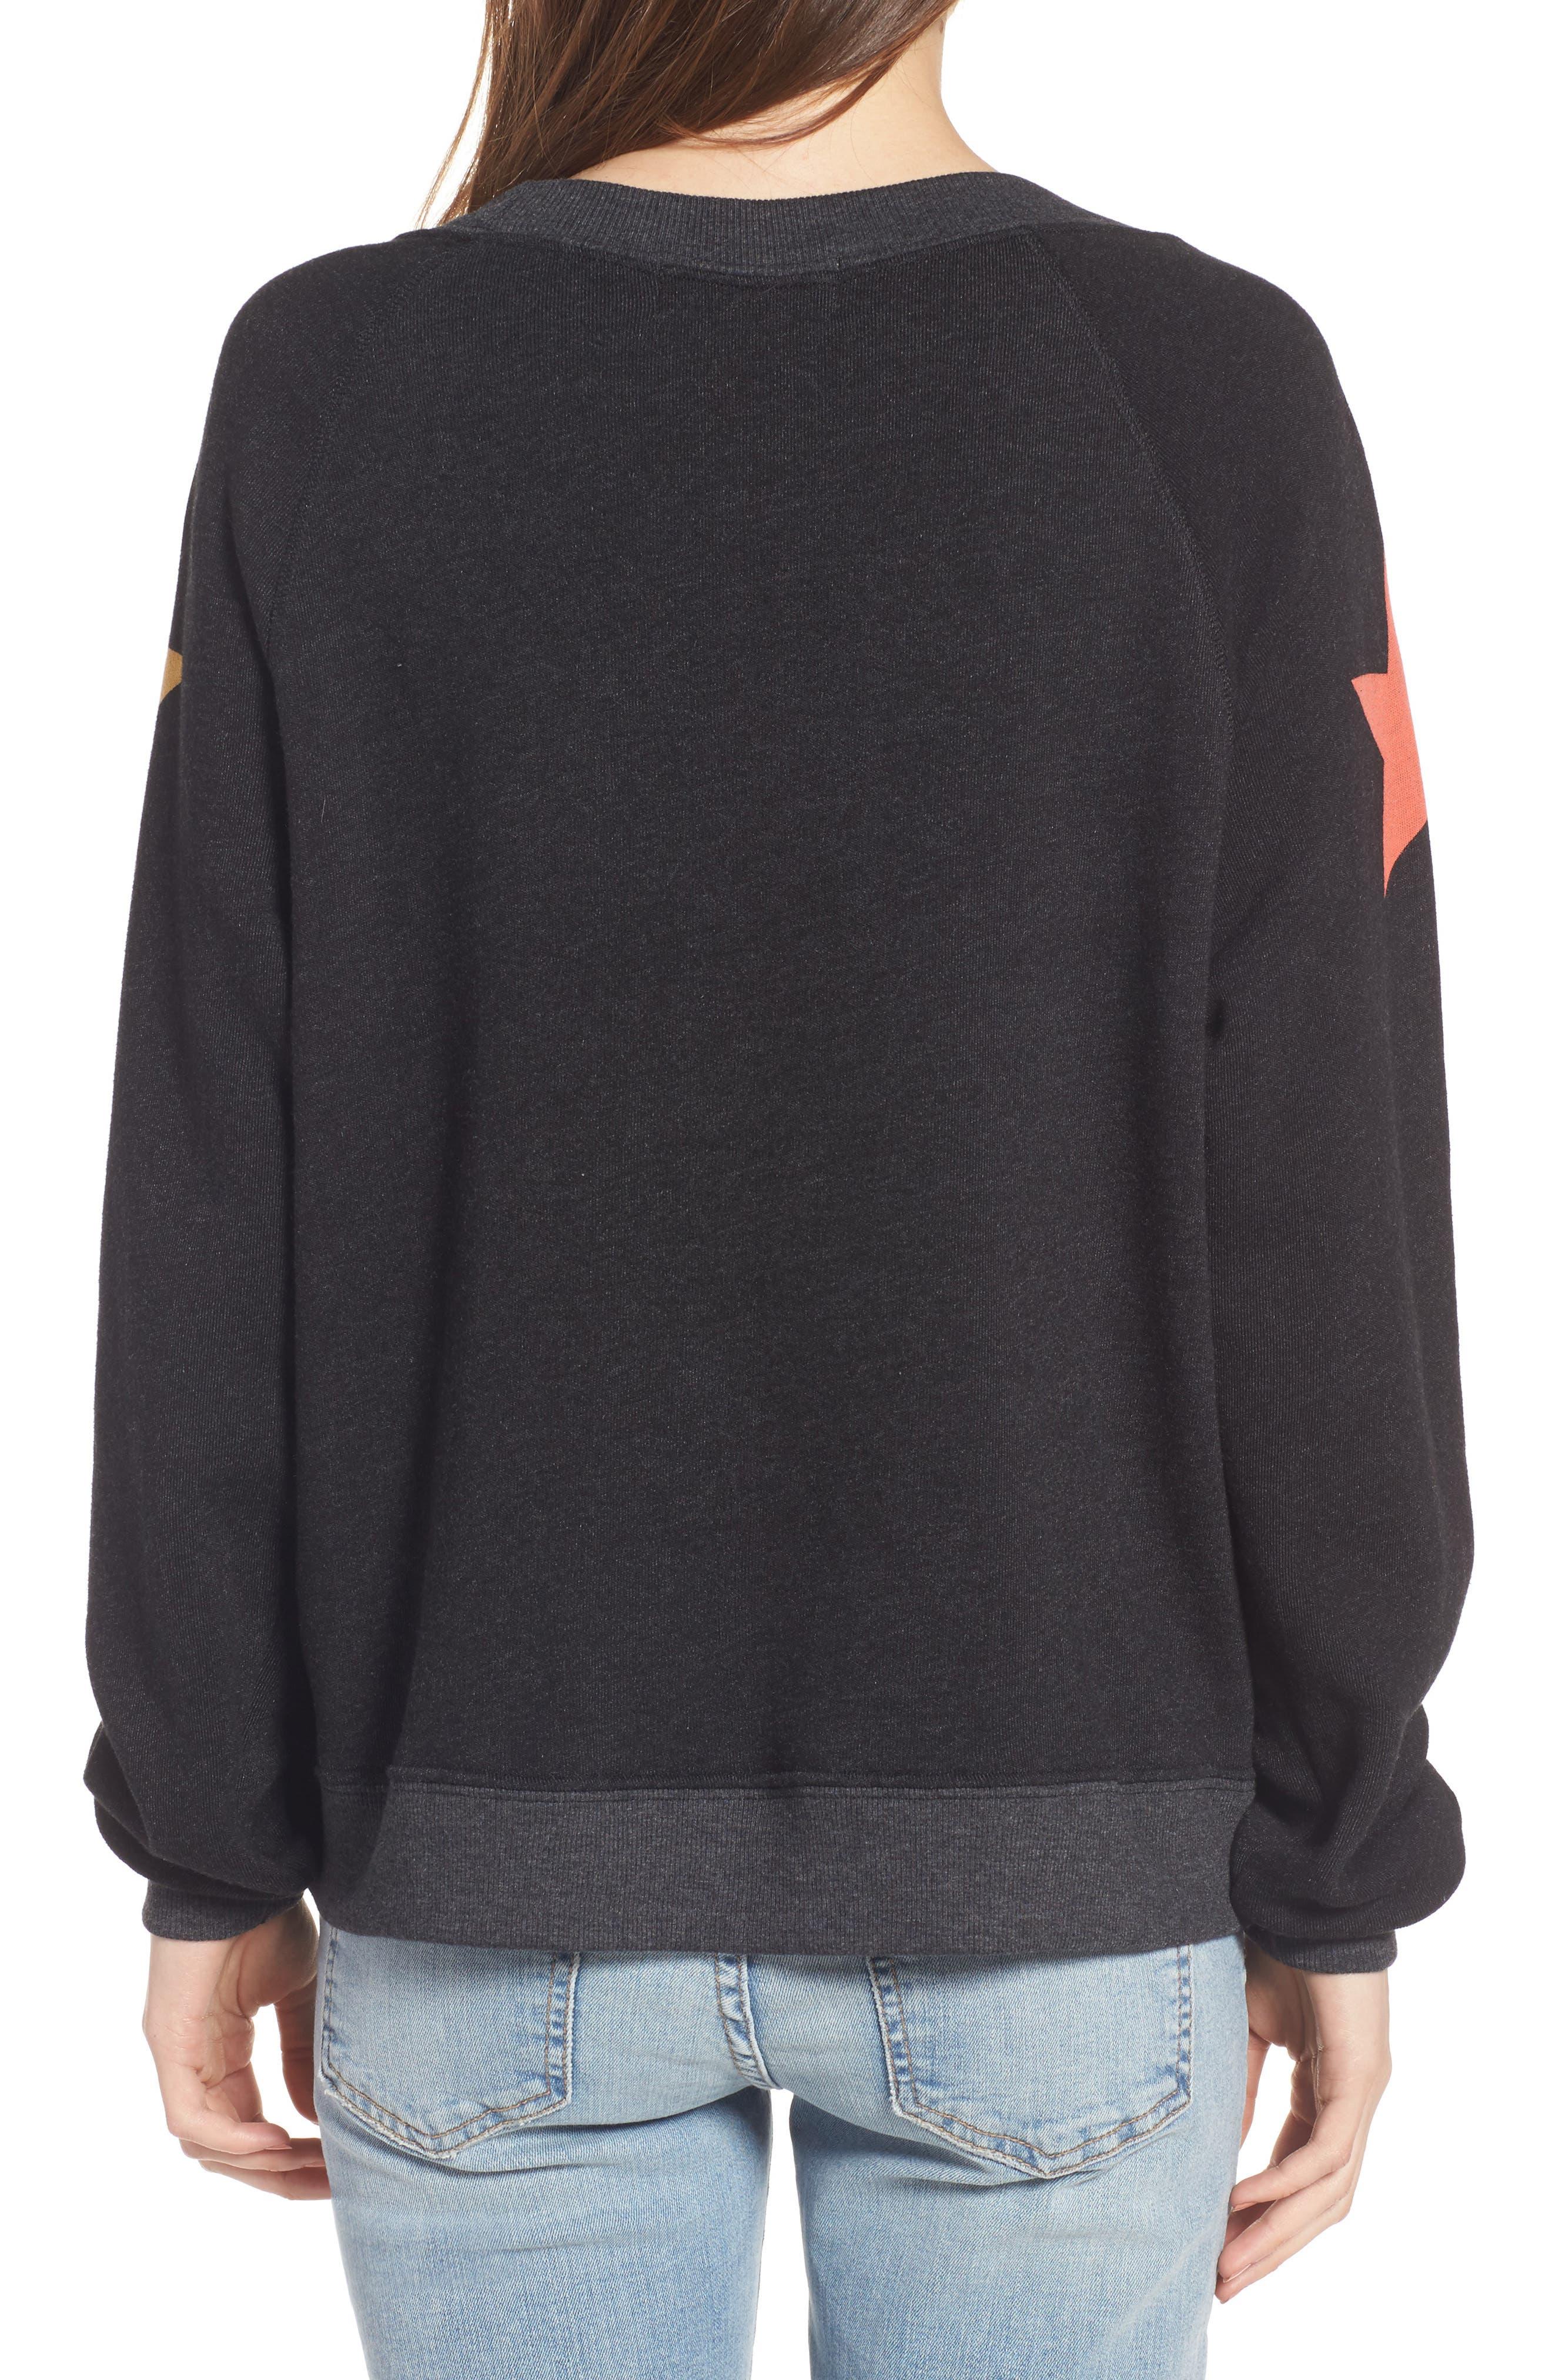 Arcade Stars Sommers Sweatshirt,                             Alternate thumbnail 2, color,                             001